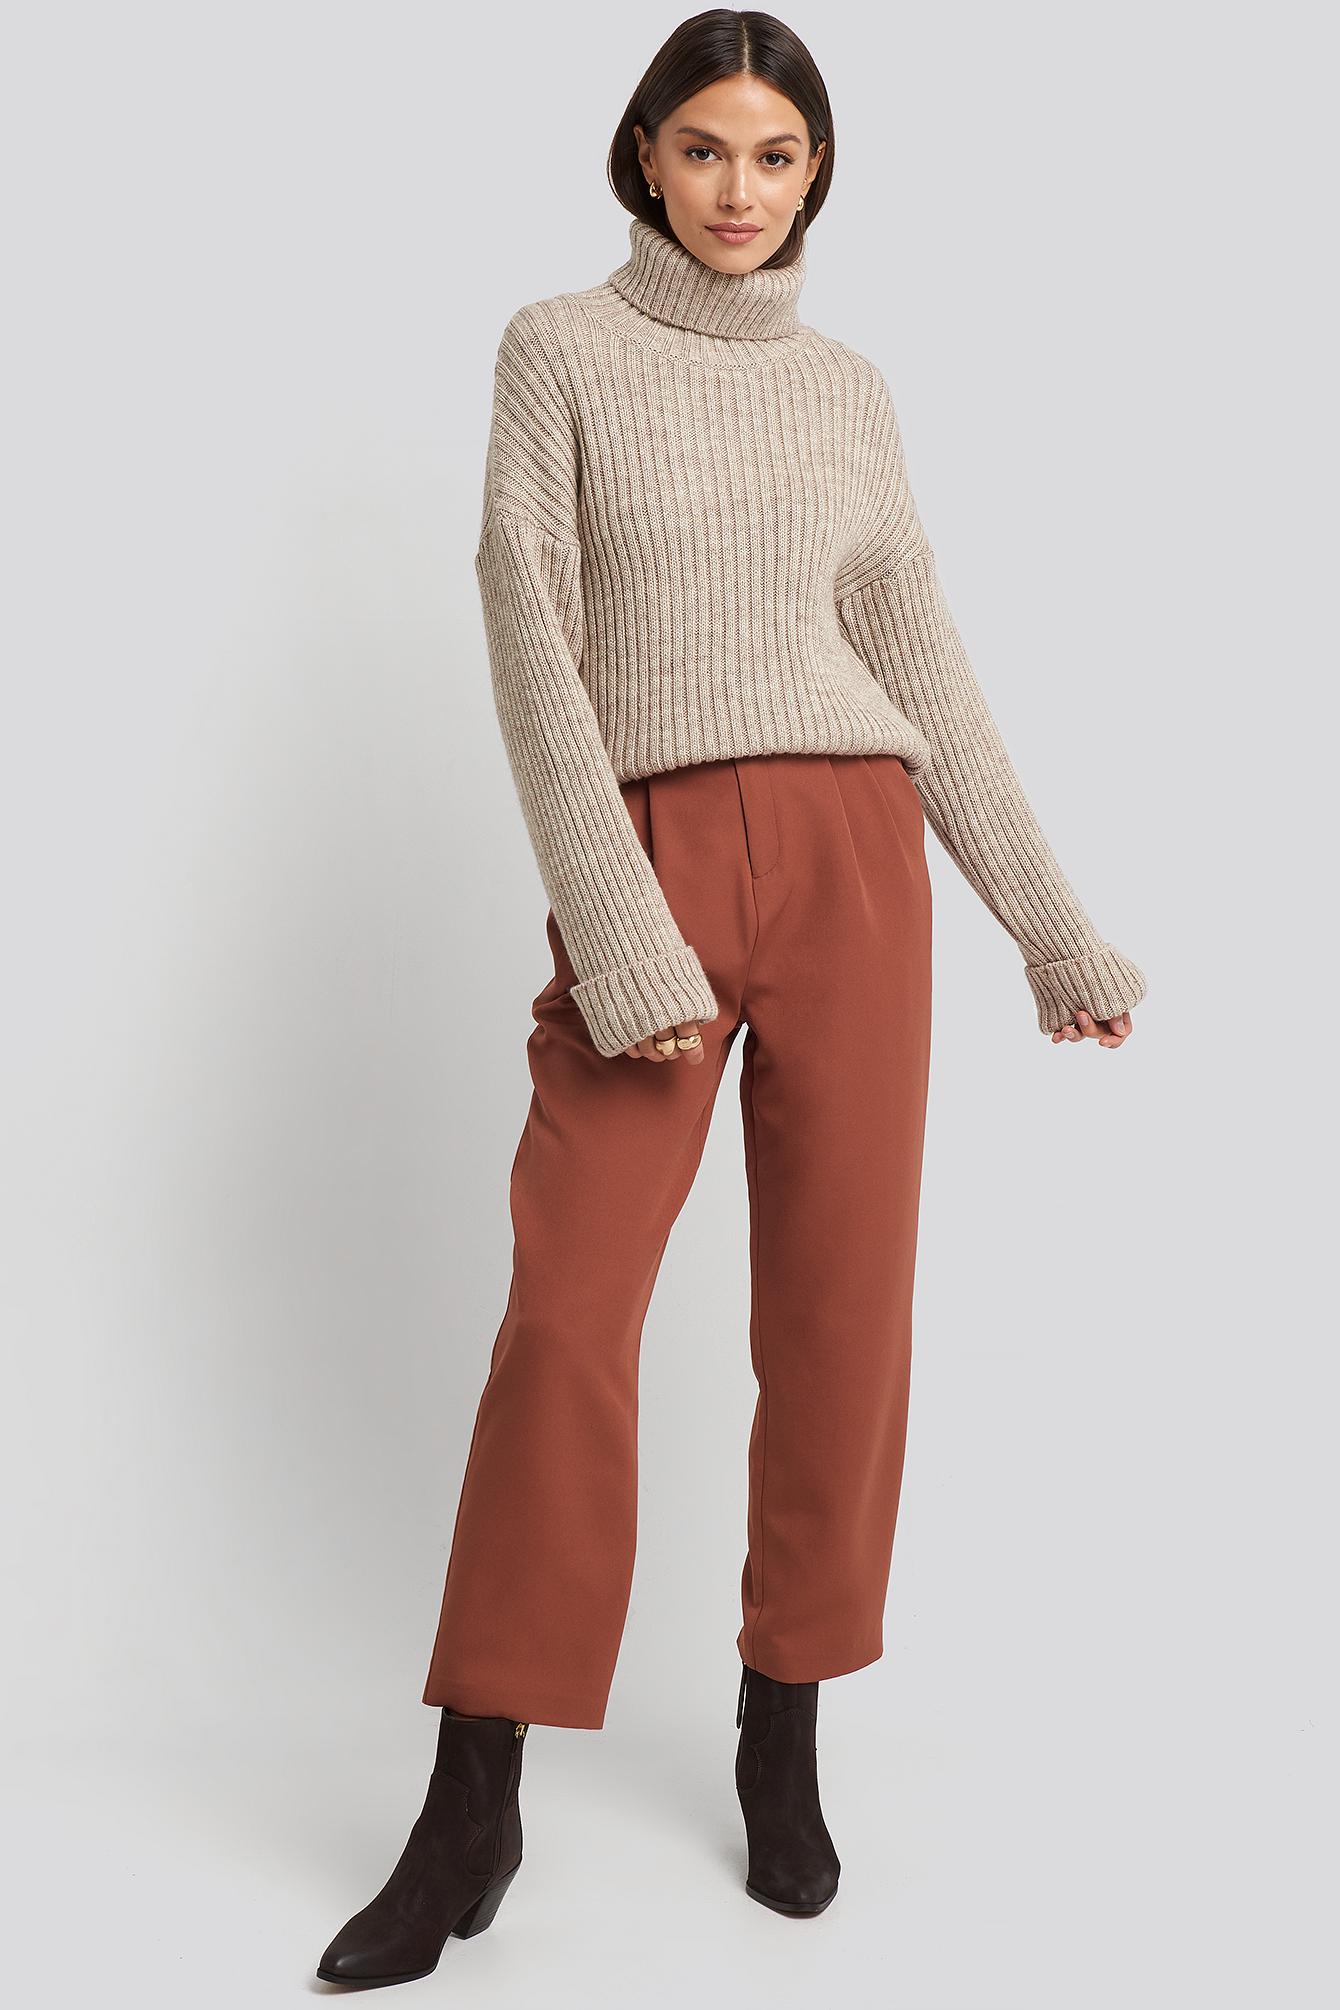 na-kd -  Belted Paperbag Tapered Pants - Brown,Orange